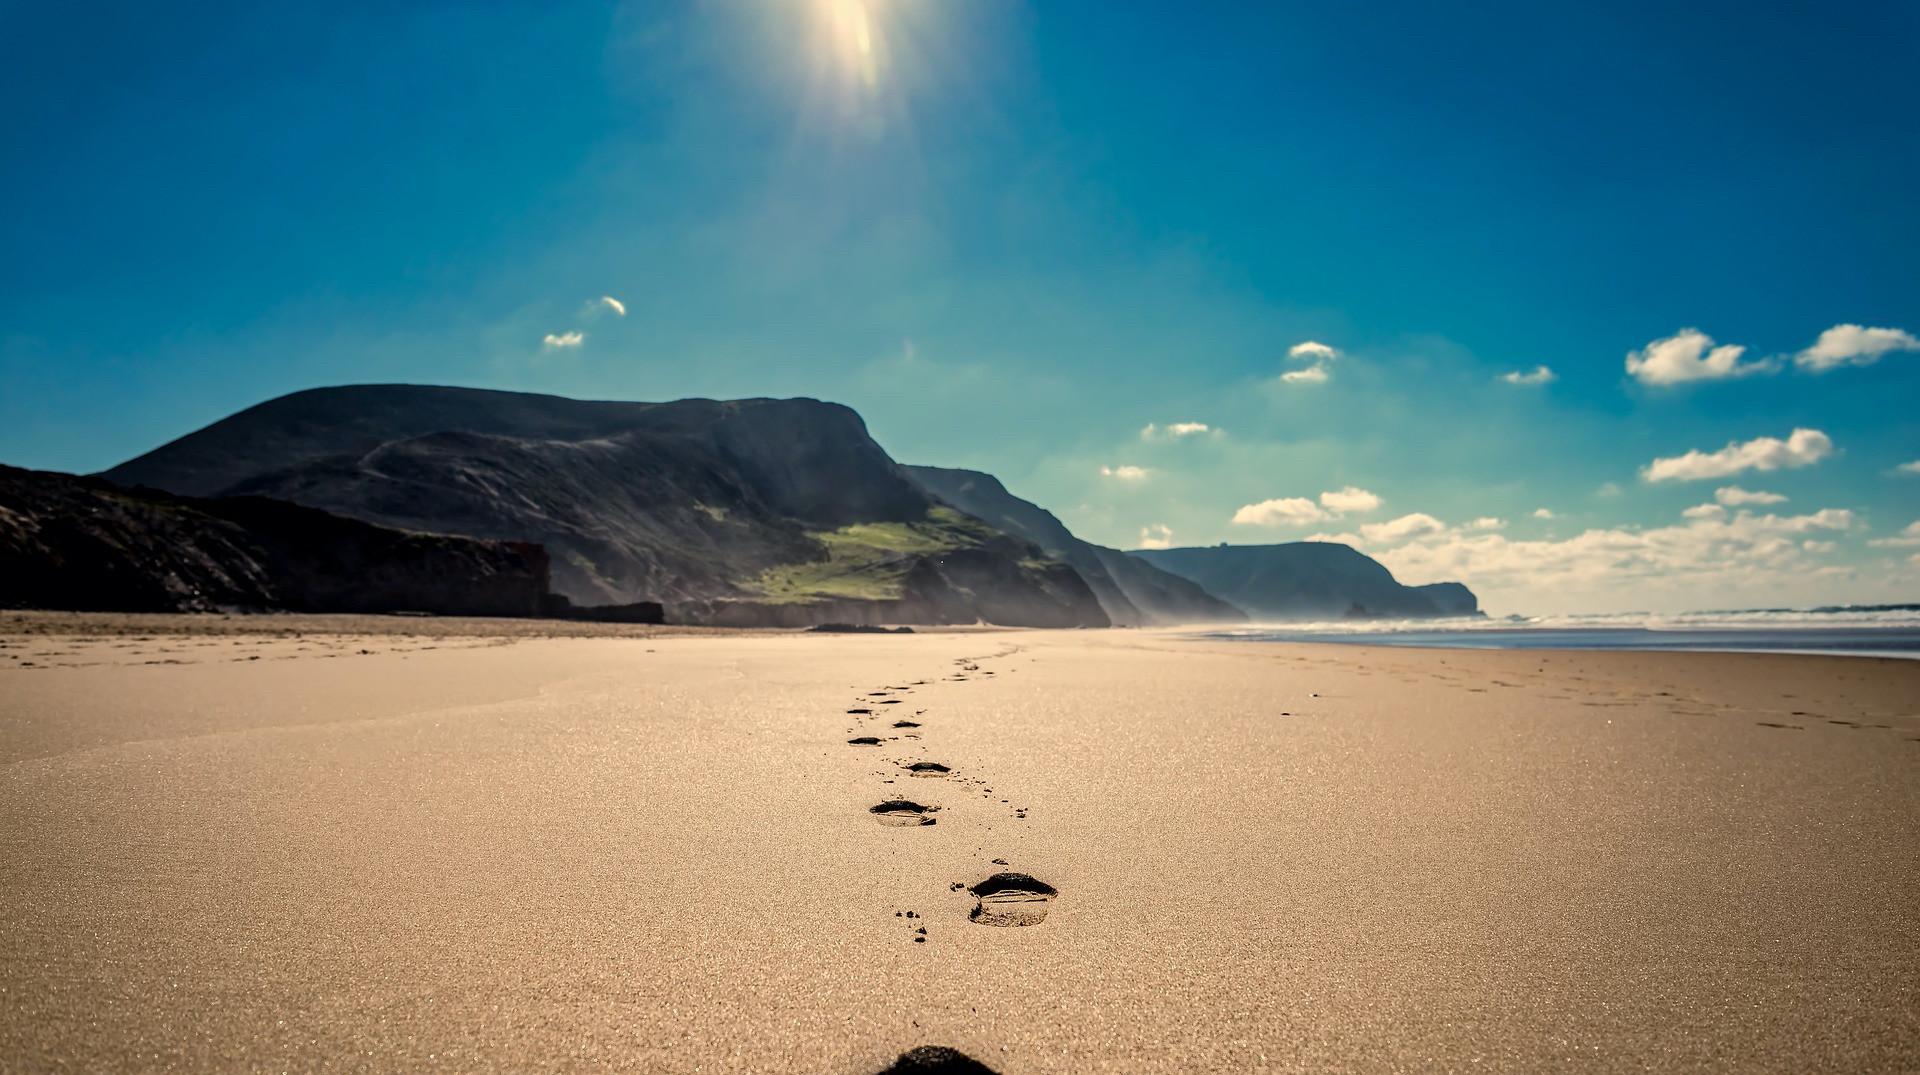 The Eternity Footprint